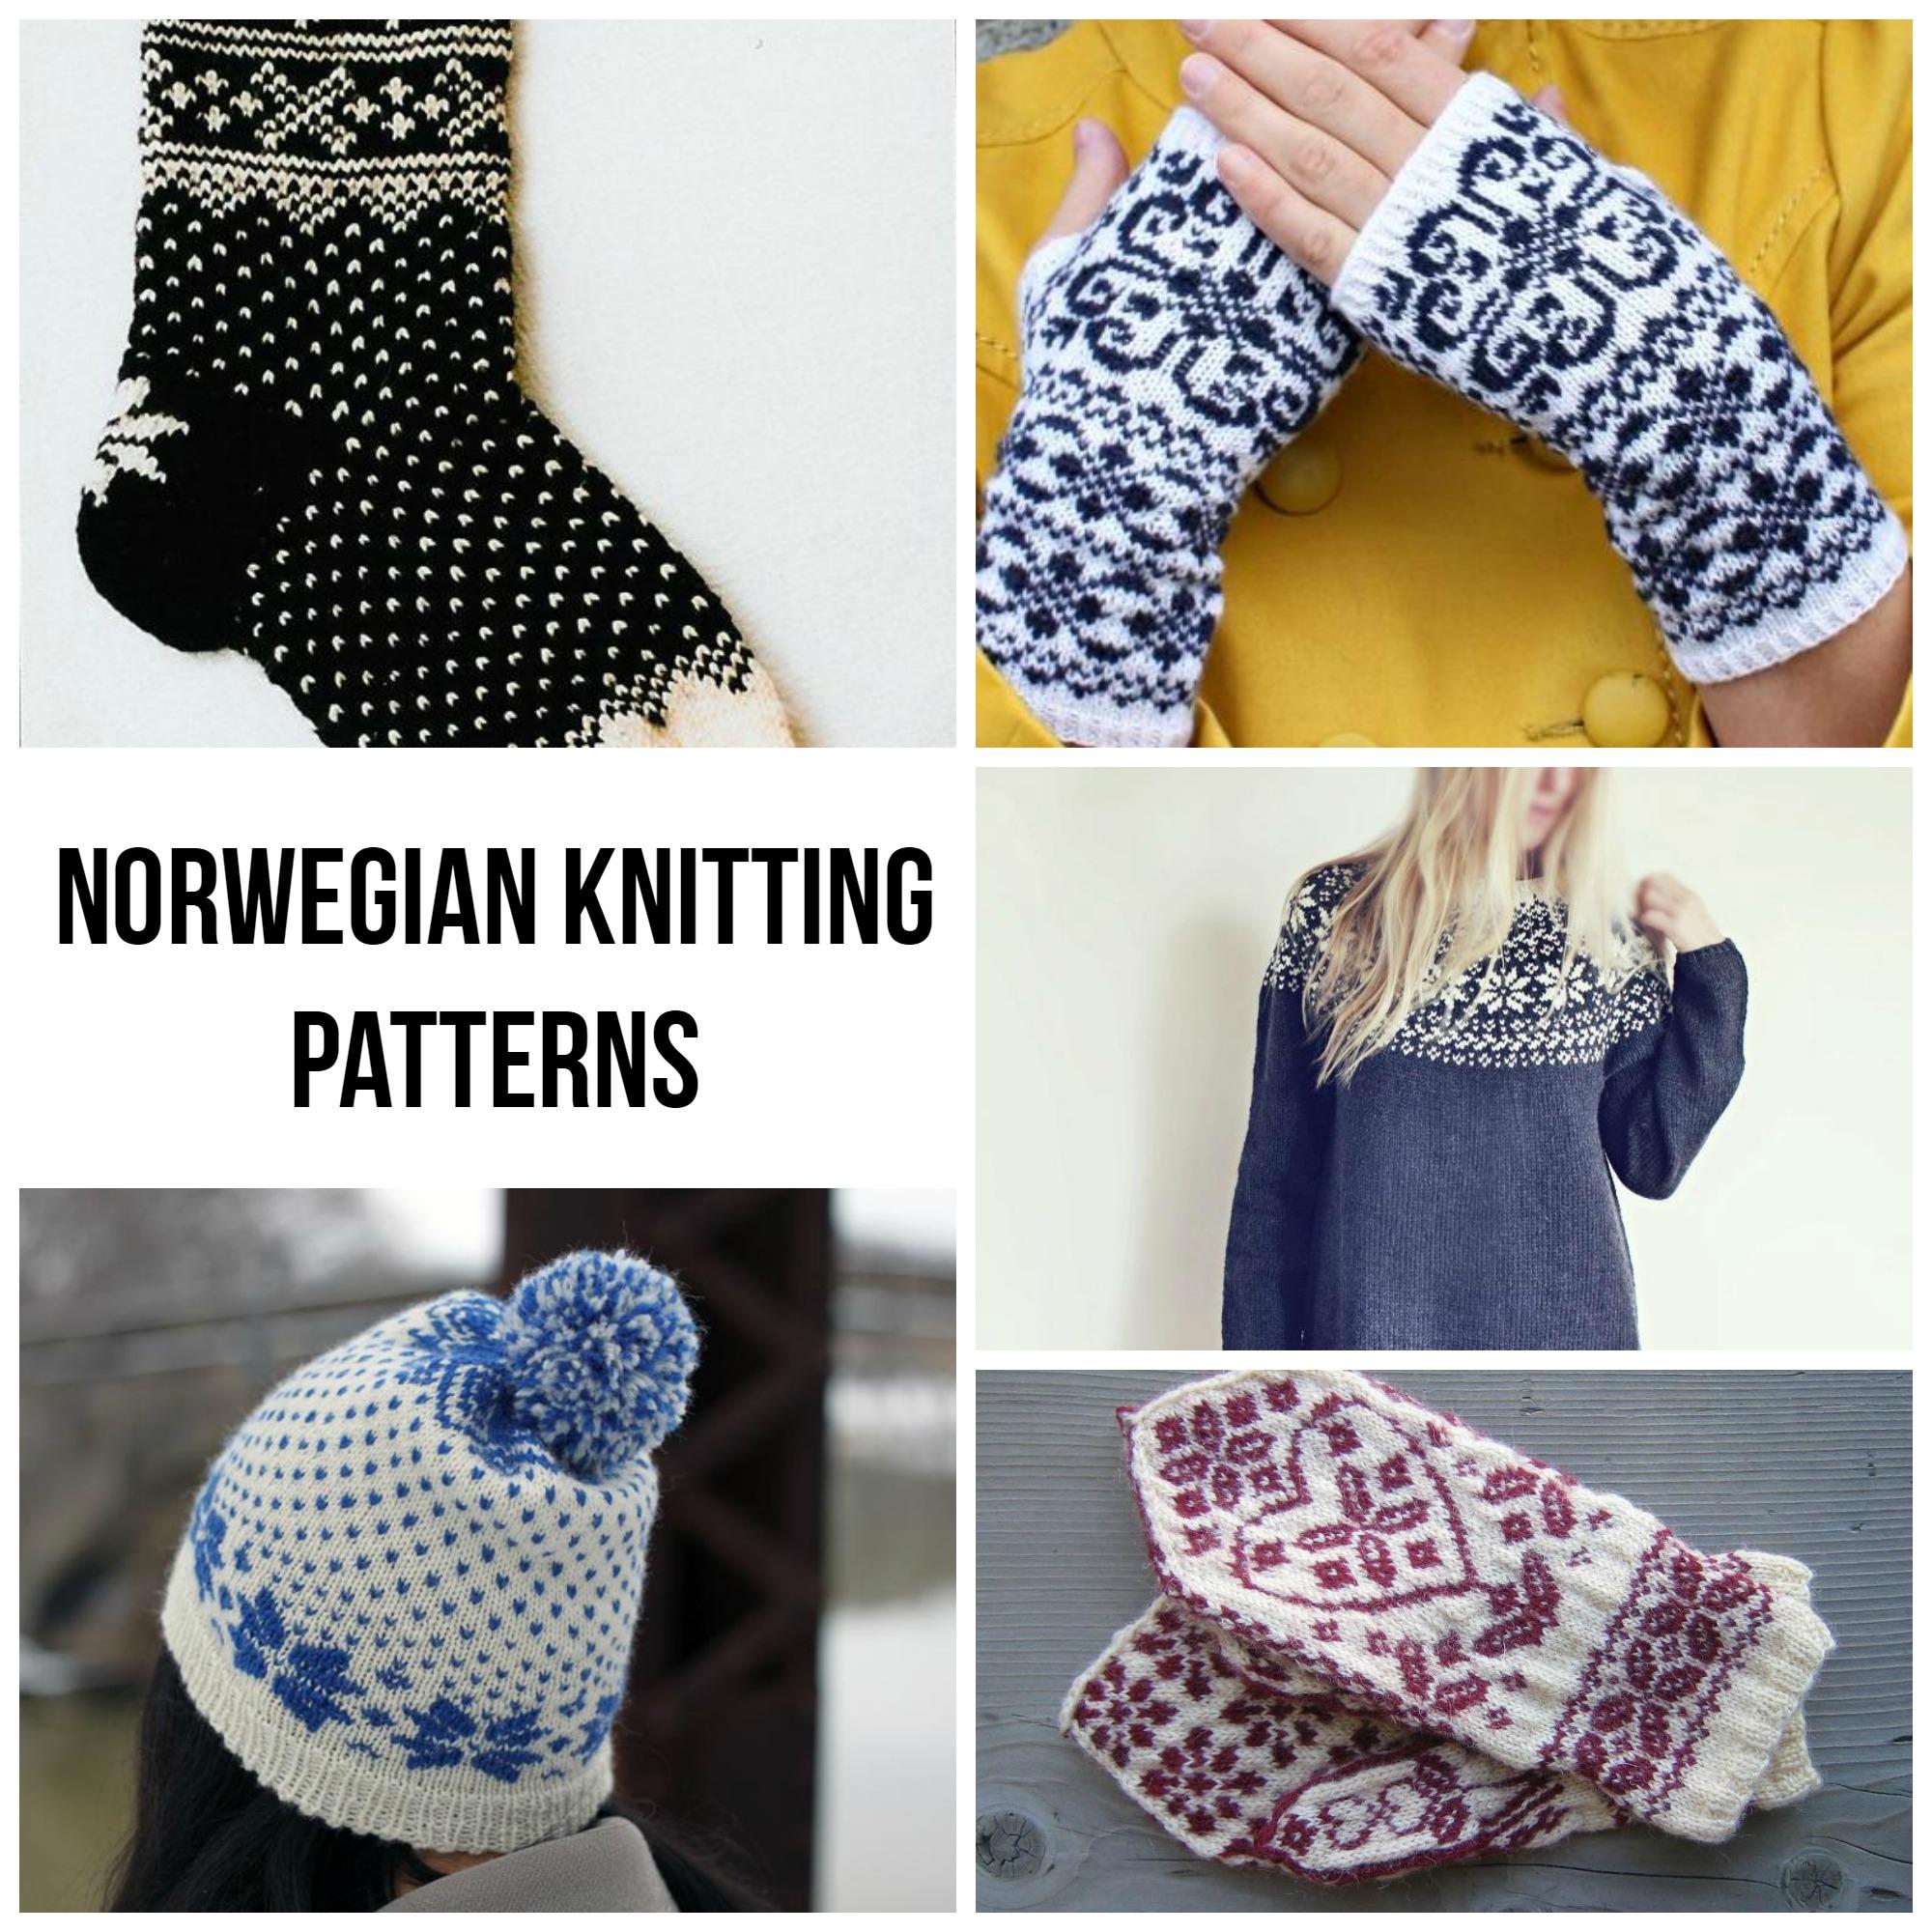 Norwegian Knitting Patterns Free Cozy Norwegian Knitting Patterns The Craftsy Blog